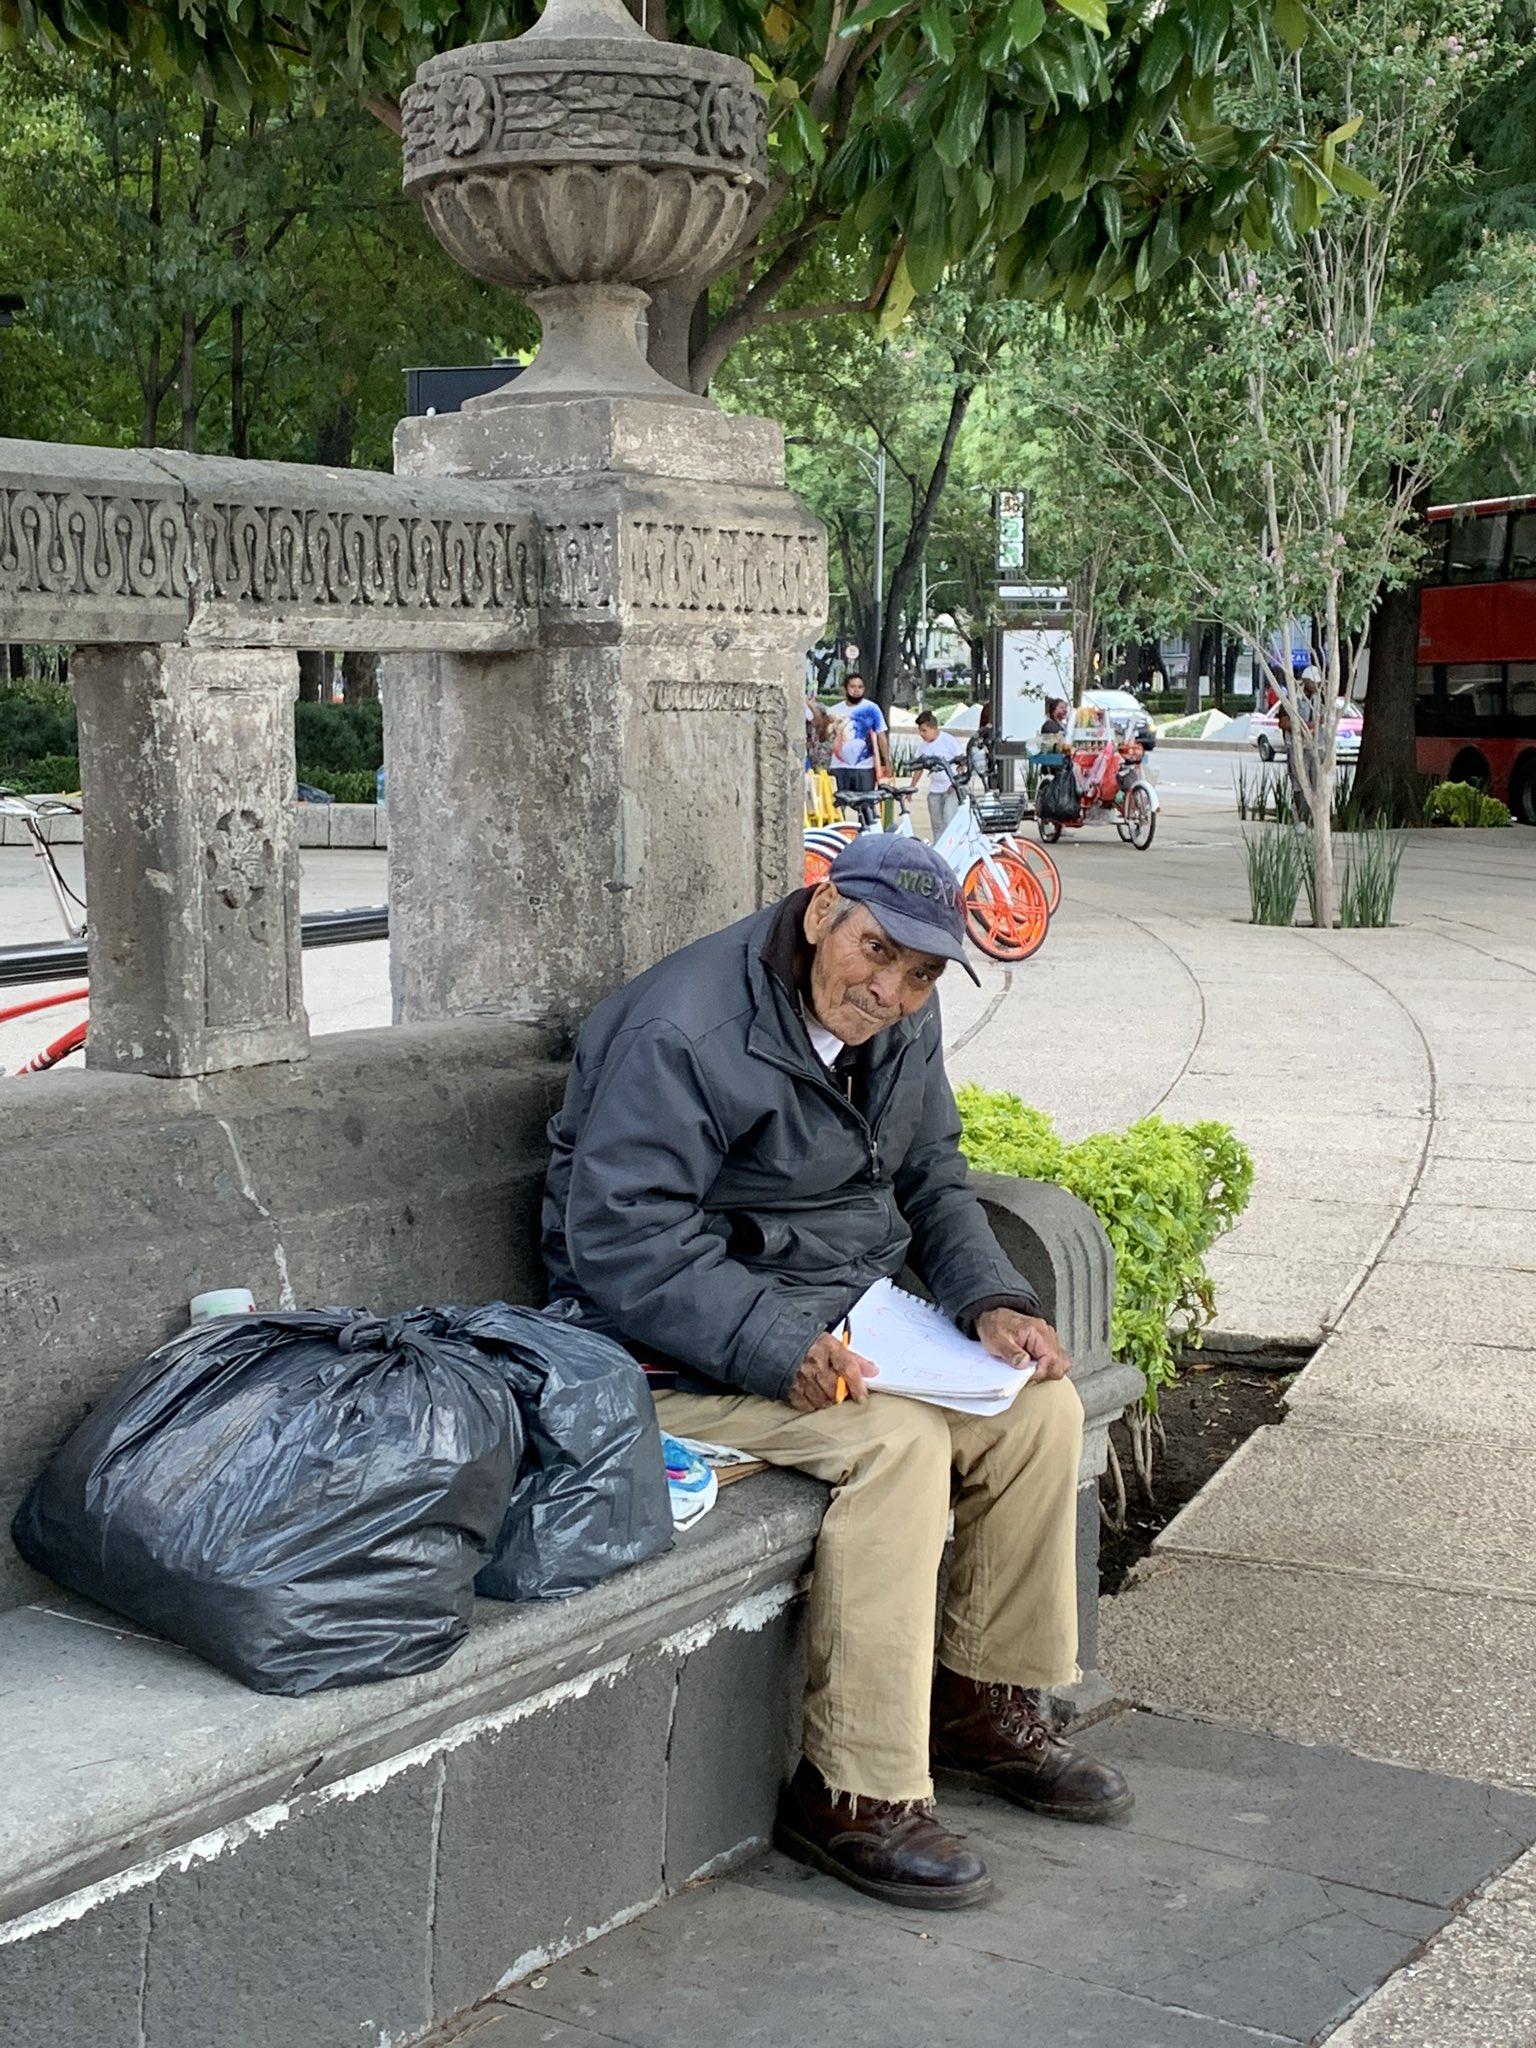 abuelito-vende-sus-dibujos-para-alimentarse3